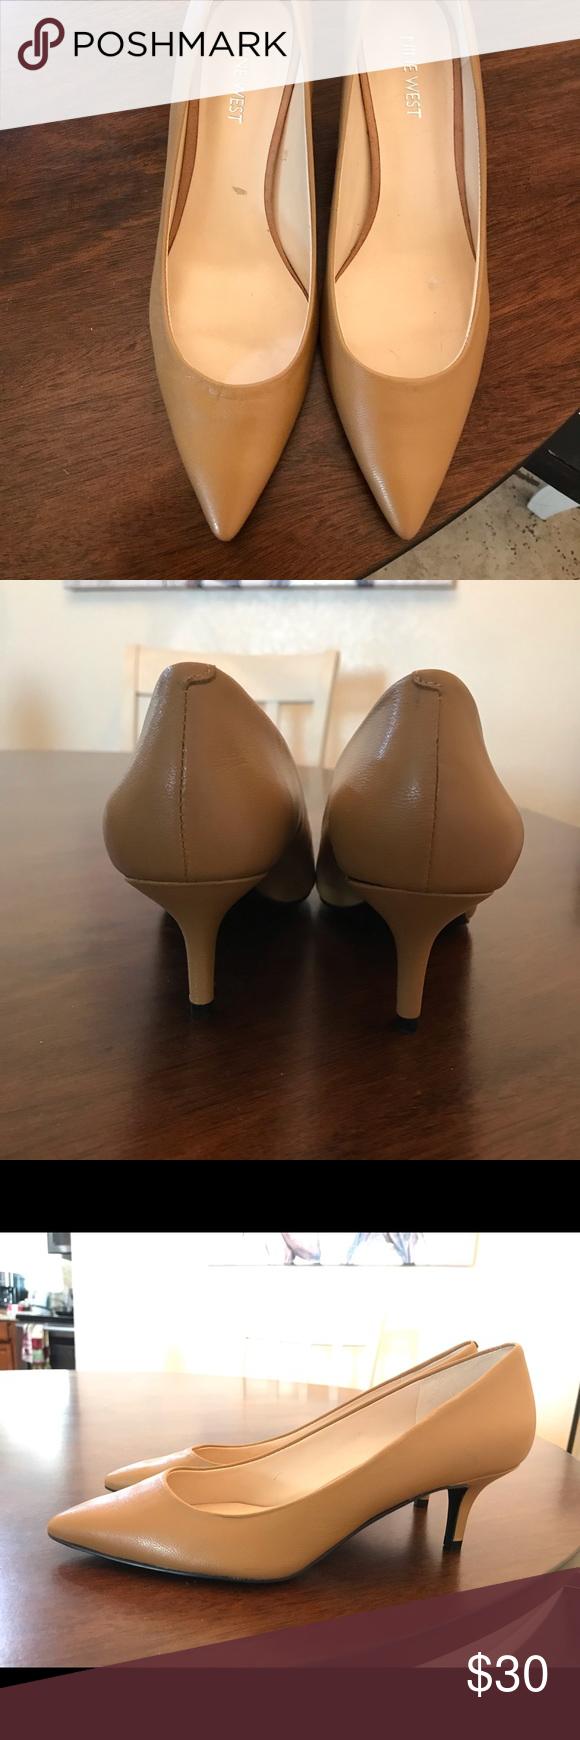 Nine West shoes, heel 2 inch, never worn. Nine West shoes